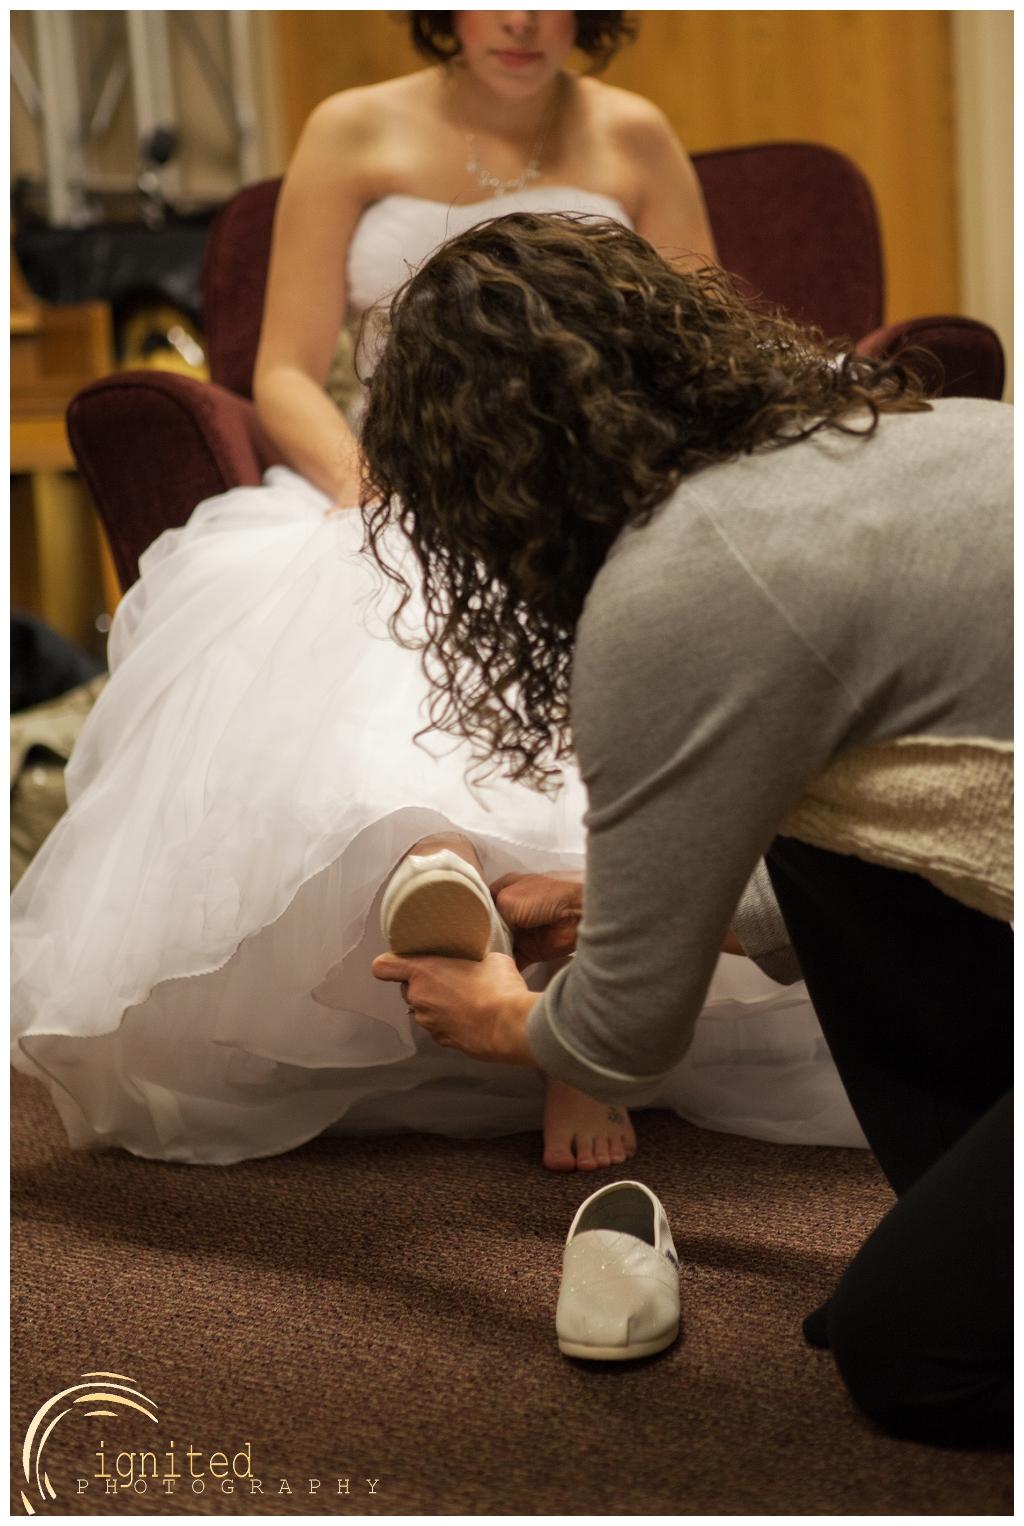 ignited Photography Alyssa  Castwell and Caleb Merna Wedding Brighton Nazarene The Naz Howell MI_0019.jpg